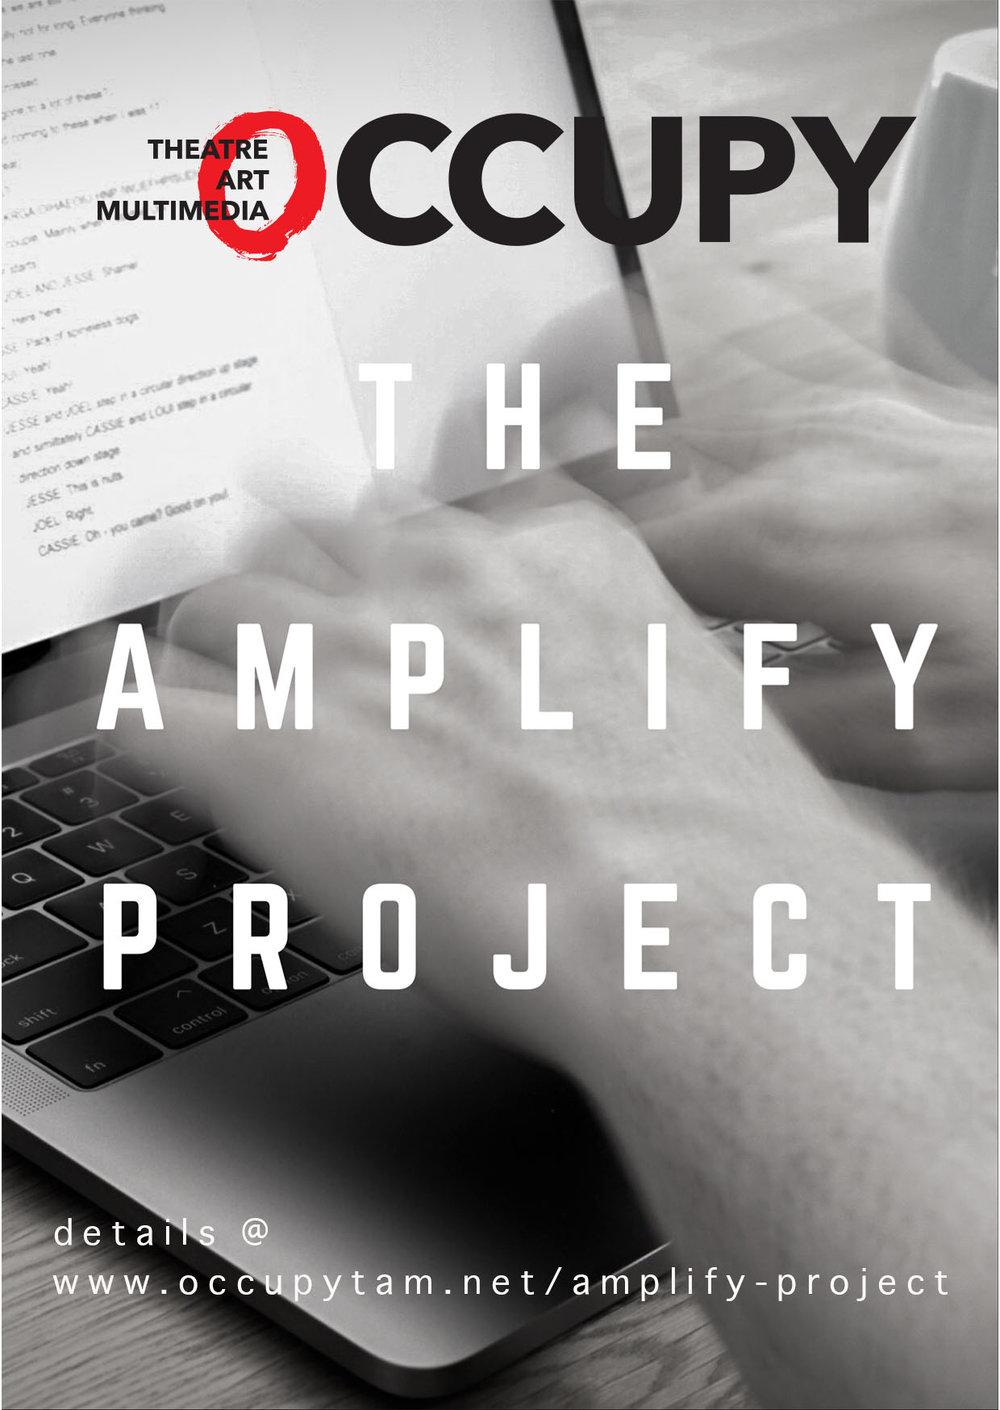 amplify project .jpg